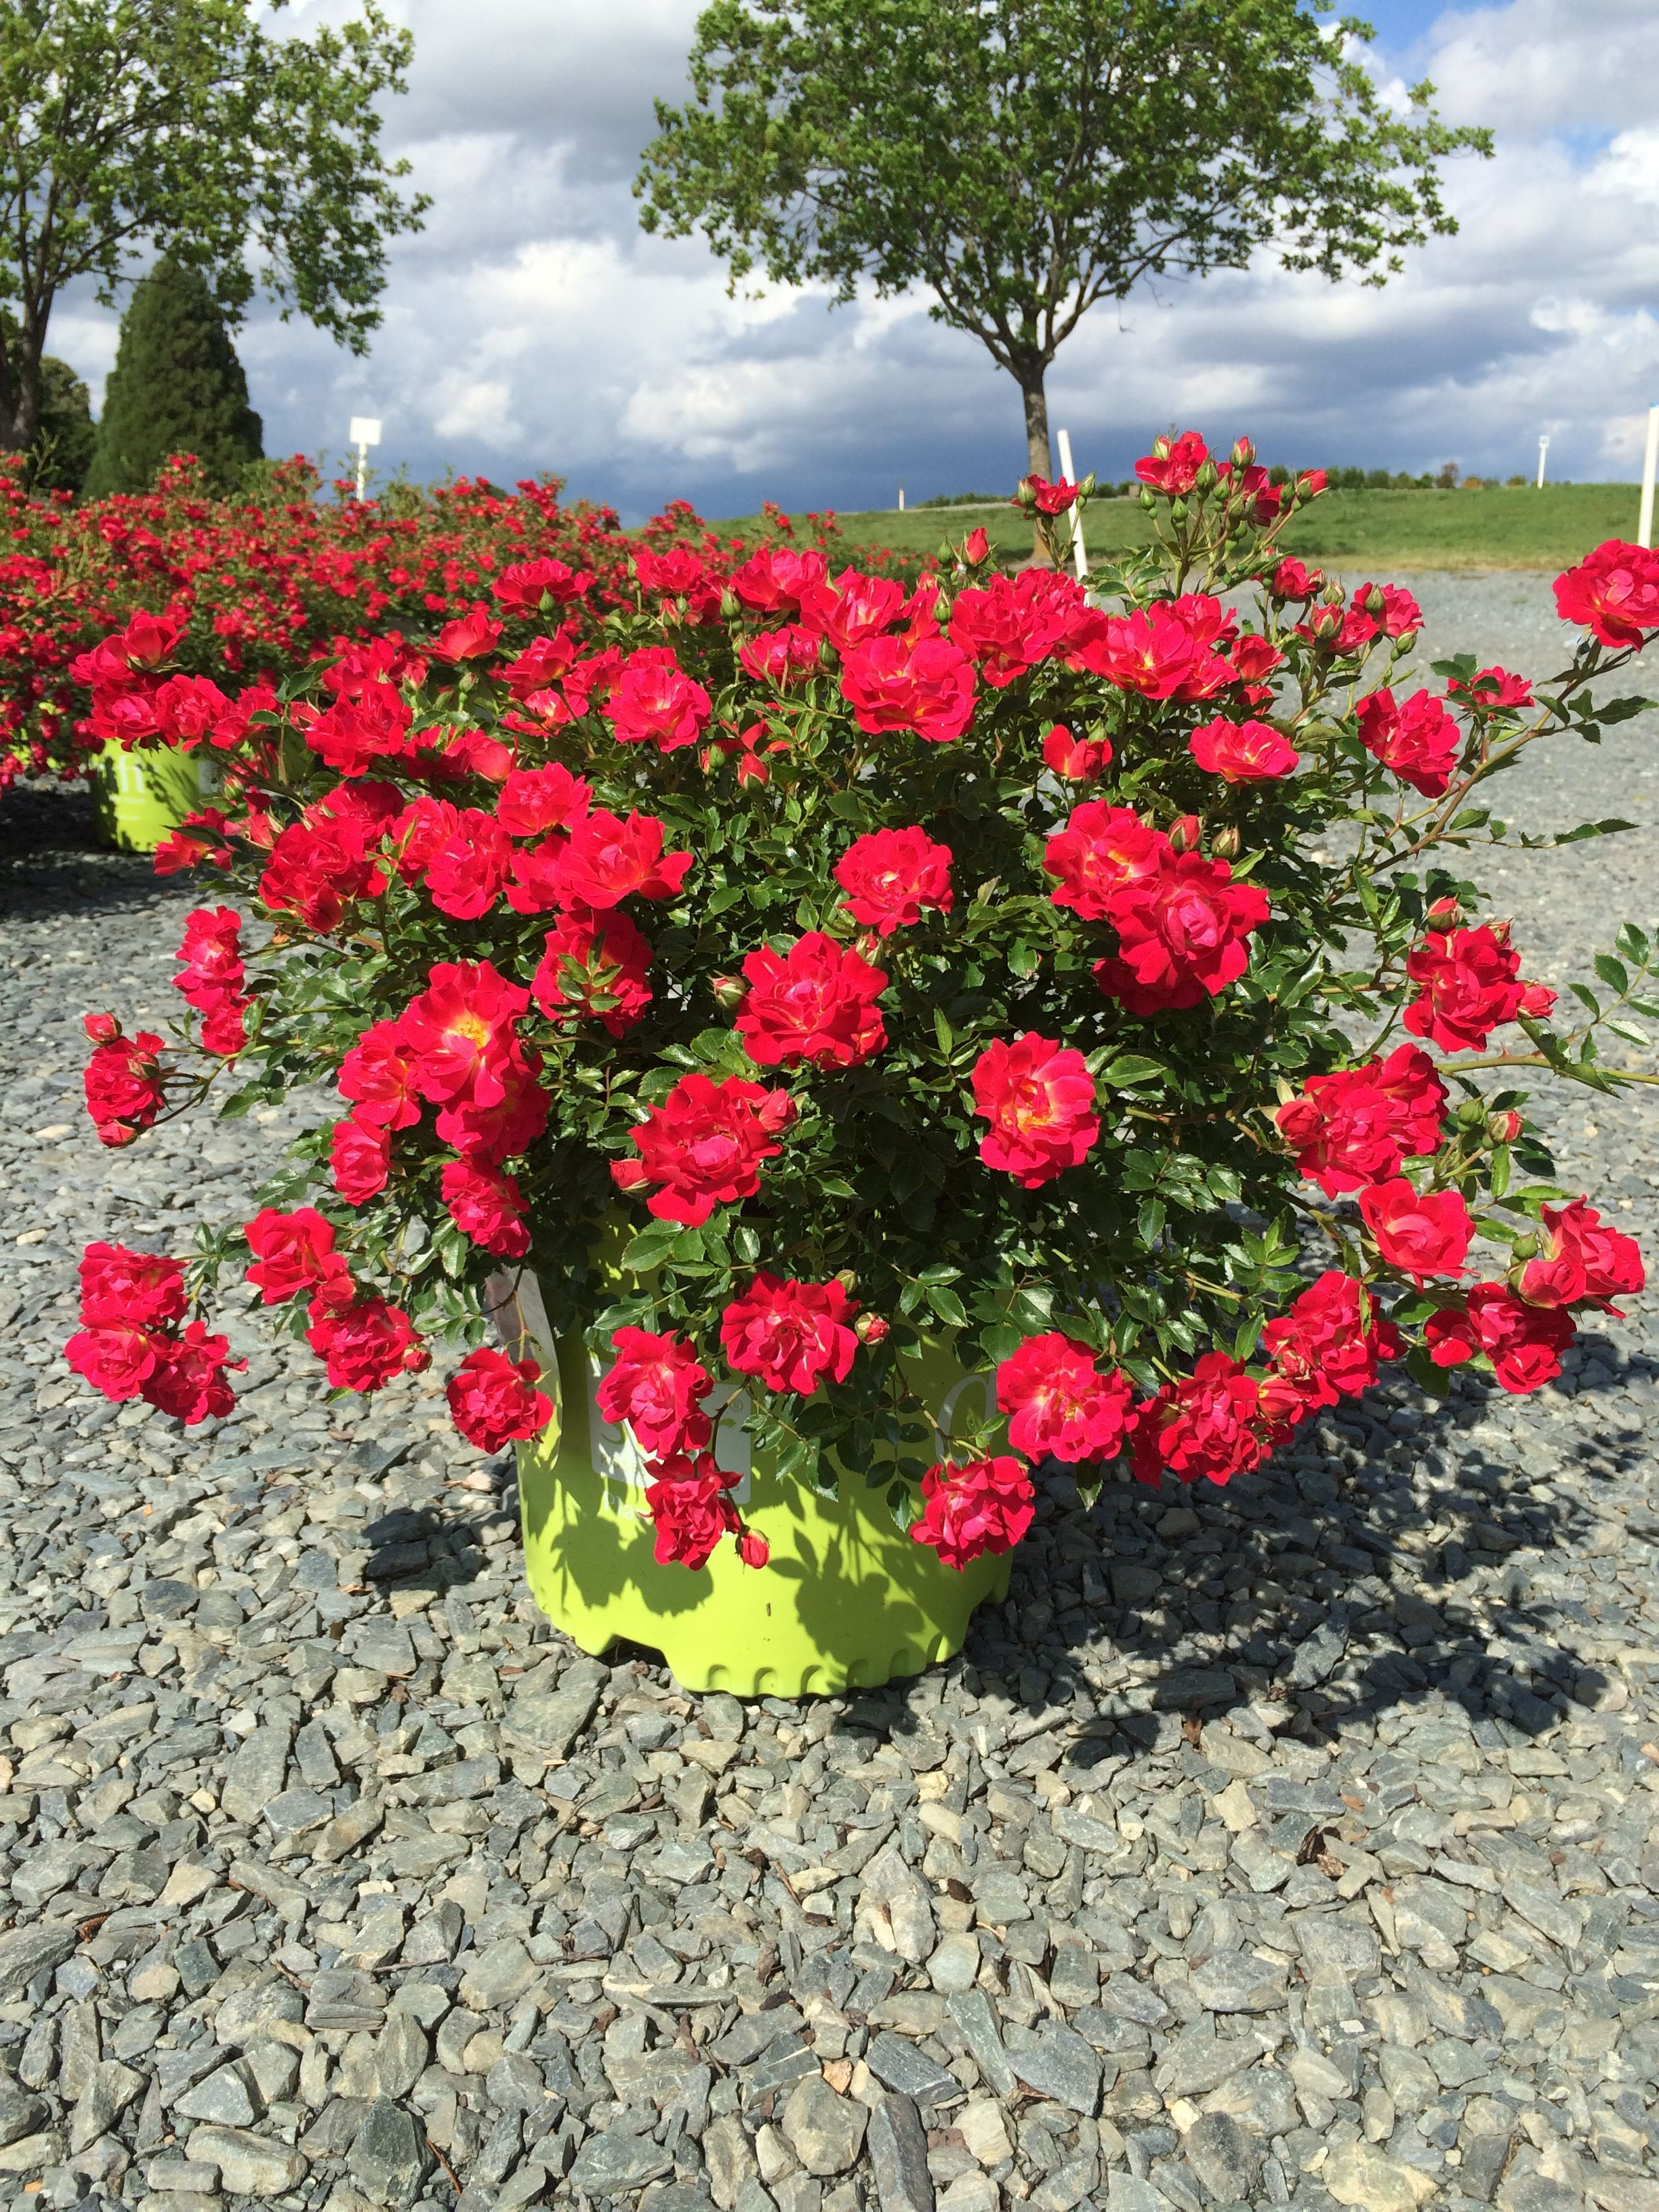 Pin by Cheryl Marcum on Latham nursery Drift roses